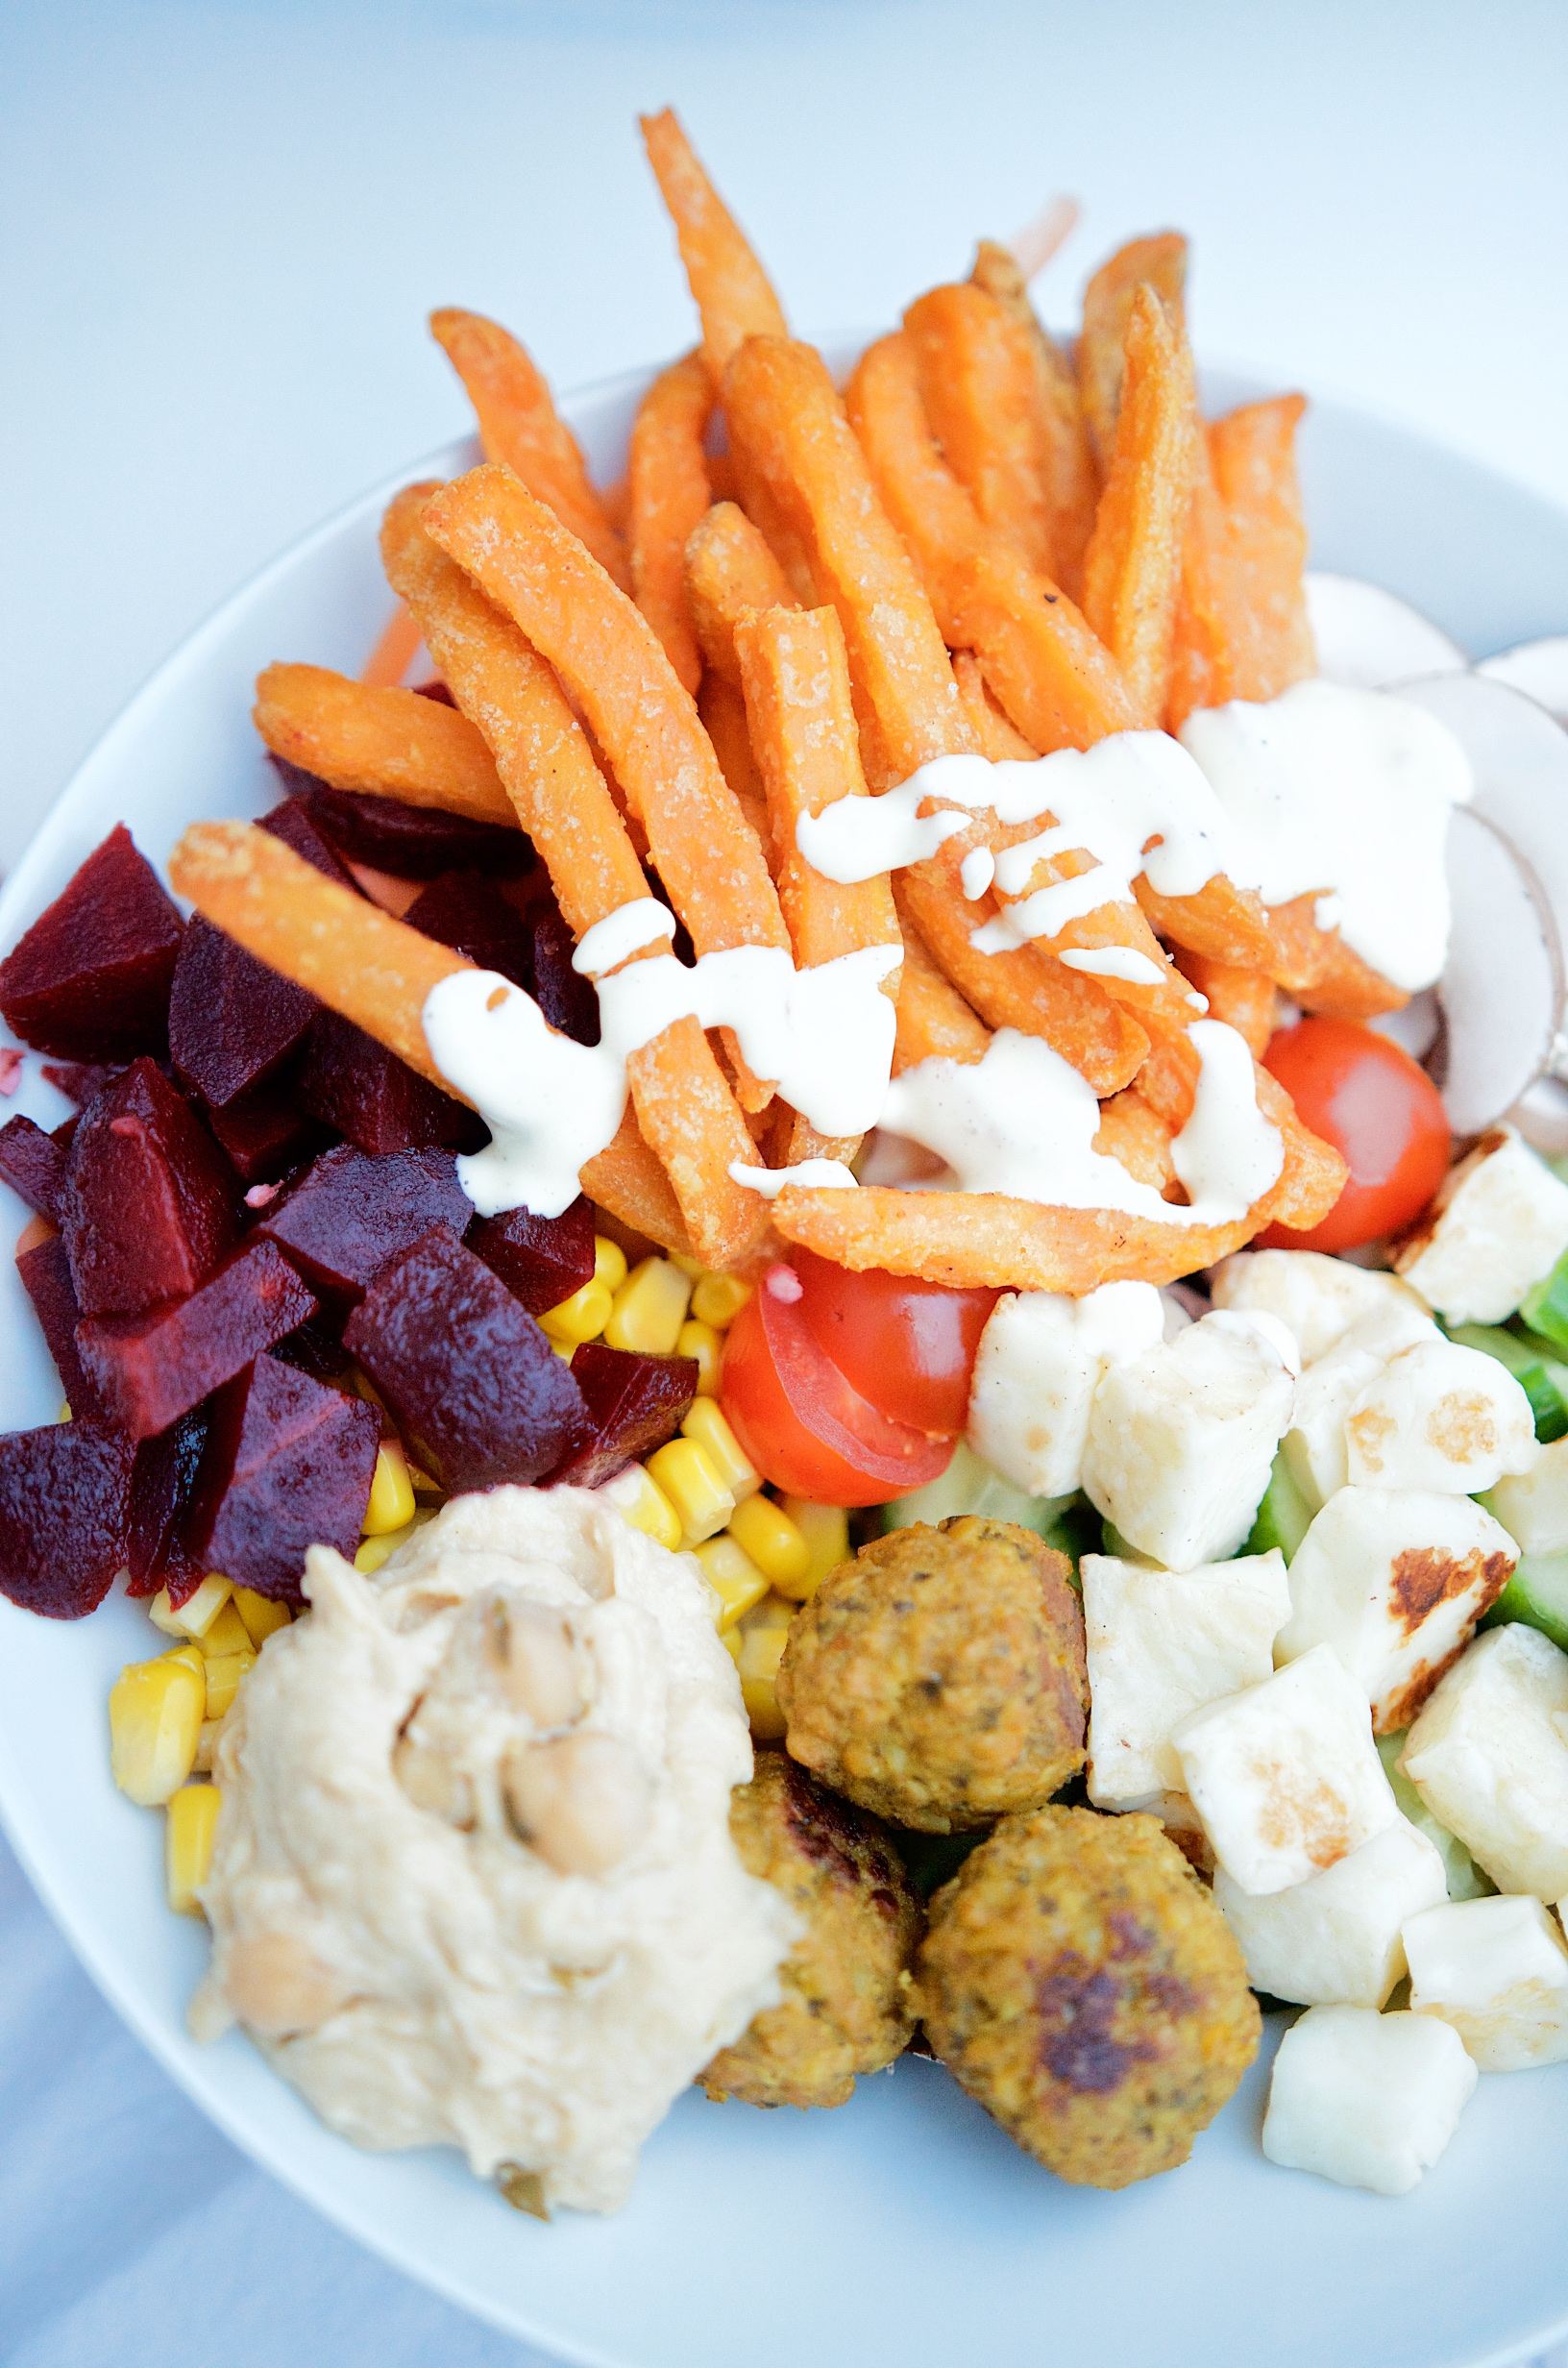 Falafelbowl mit Süßkartoffelpommes, selbstgemachtem Ketchup und Mayonnaise | Pinkepank (1)